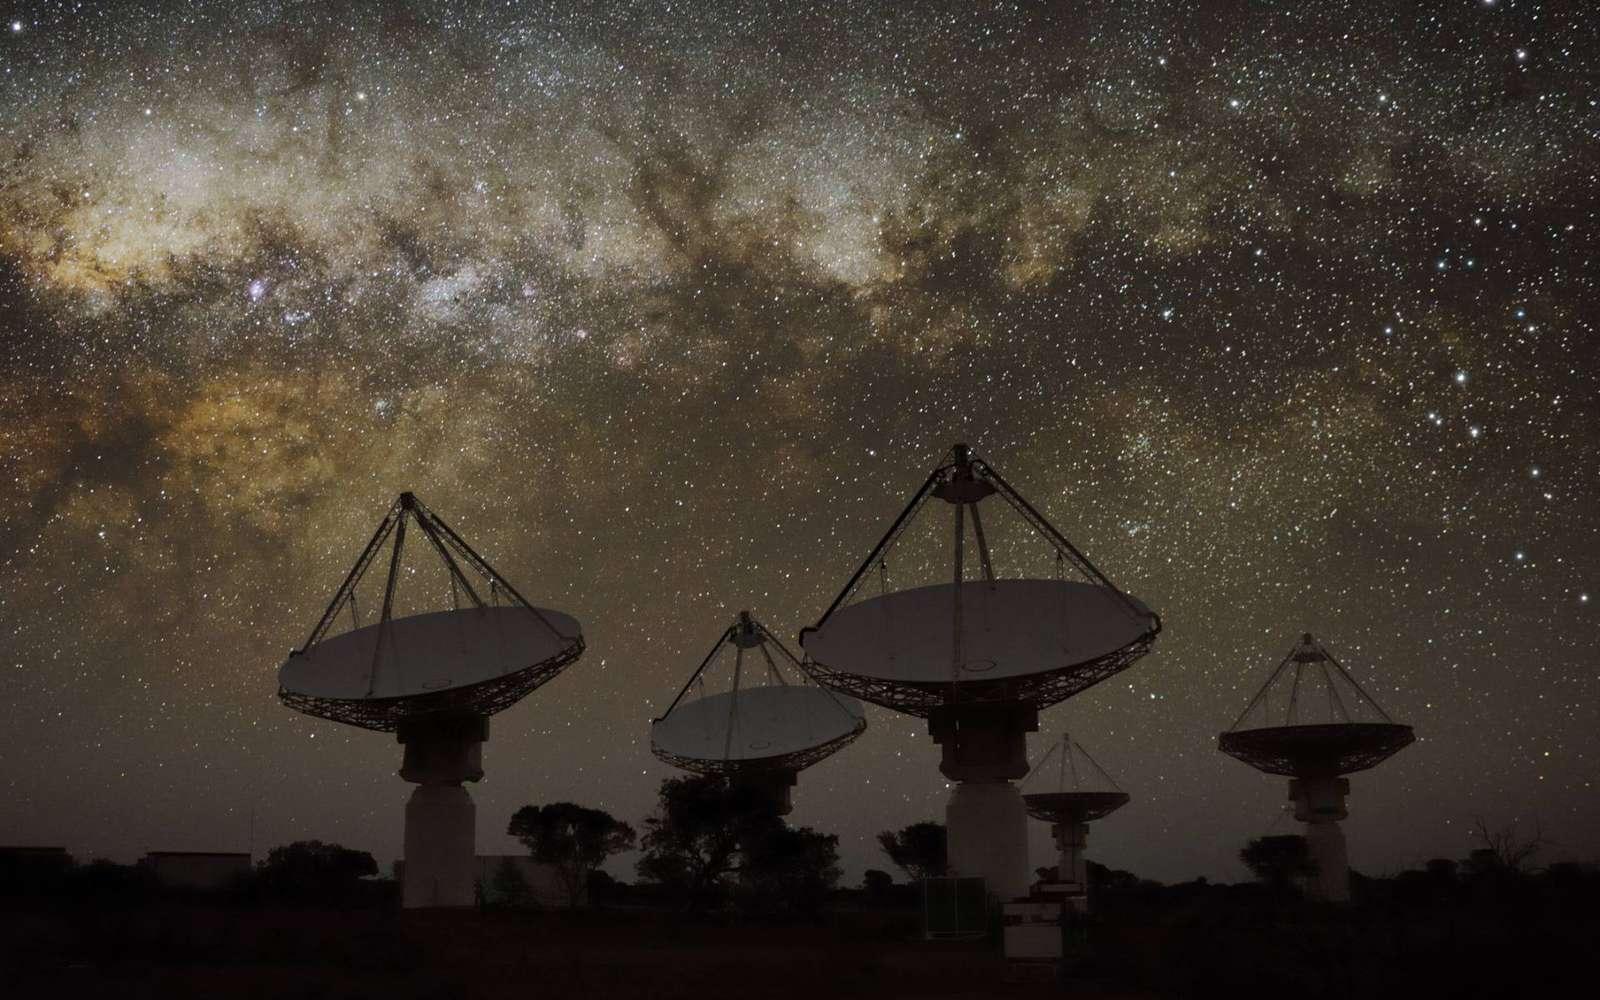 askap teleszkop tavcsov univerzum kutatas